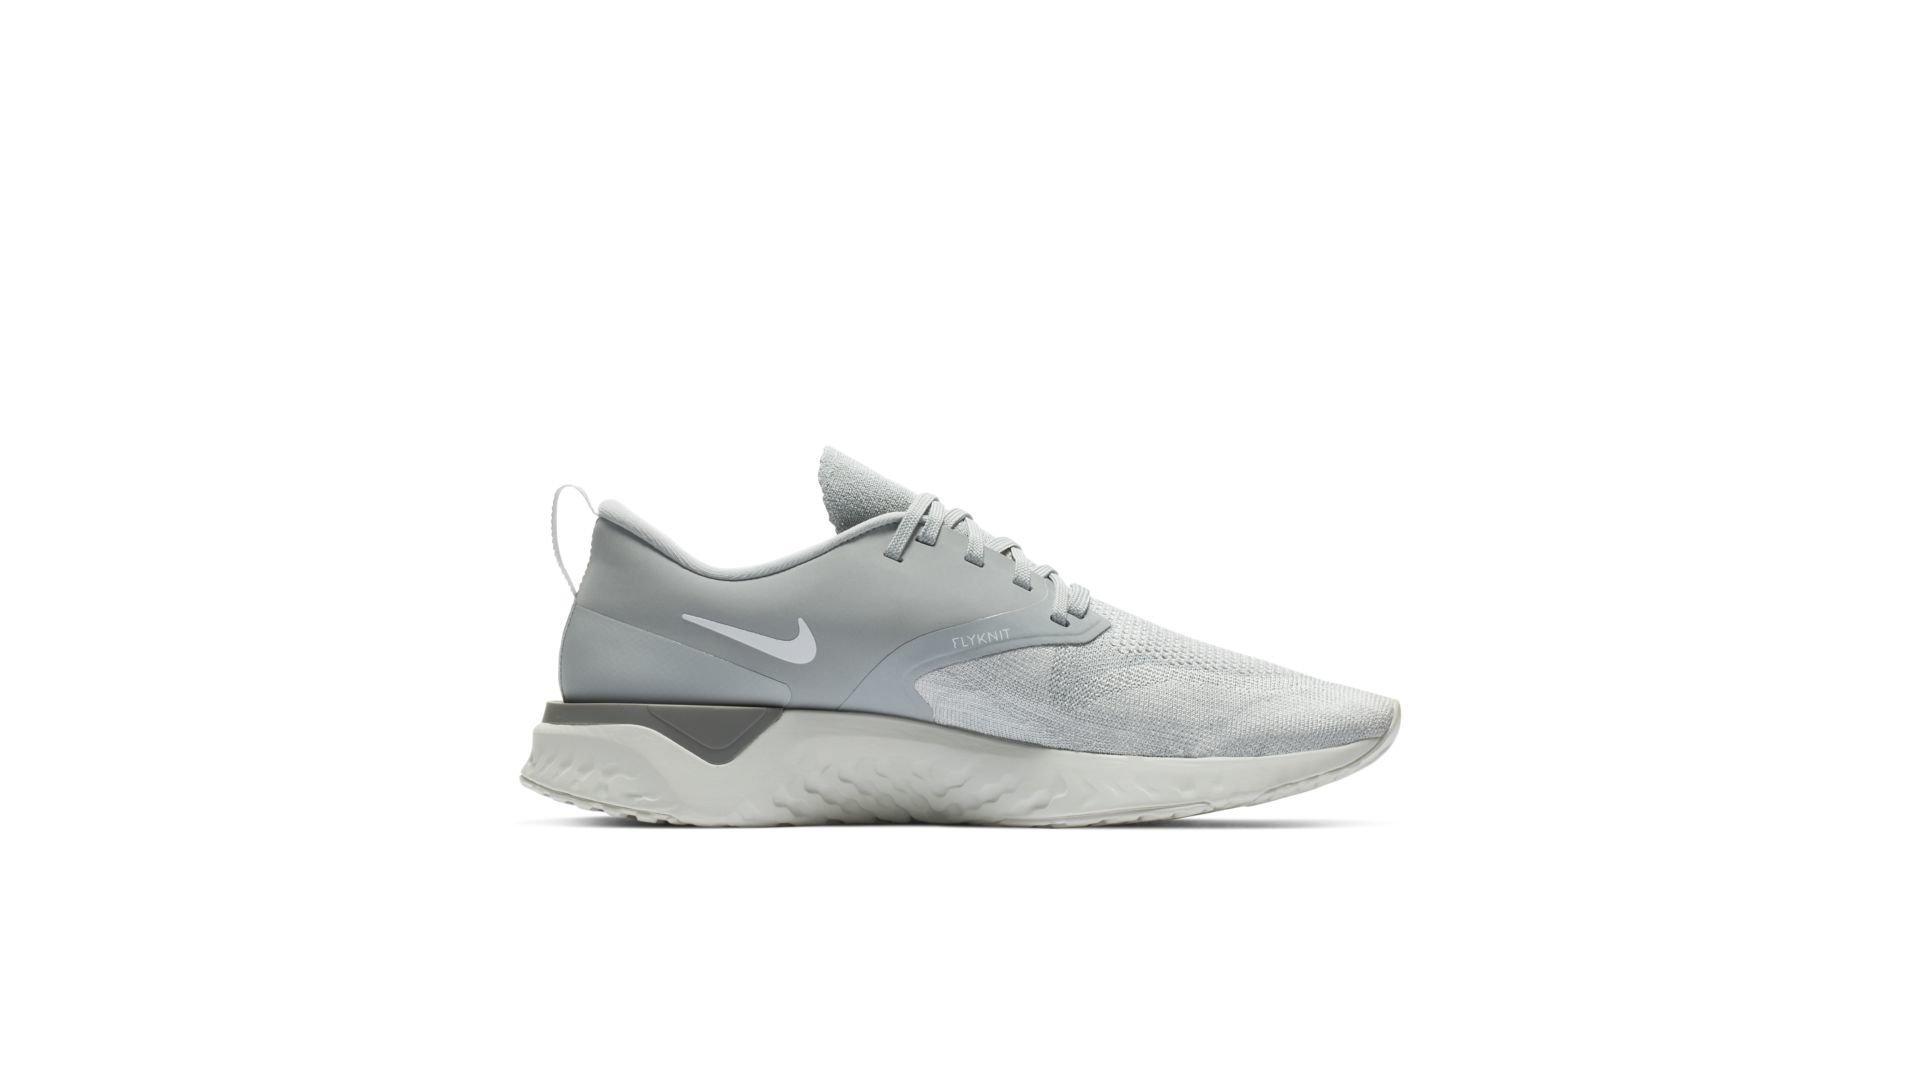 Nike Odyssey React 2 Flyknit Wolf Grey White (AH1015-001)